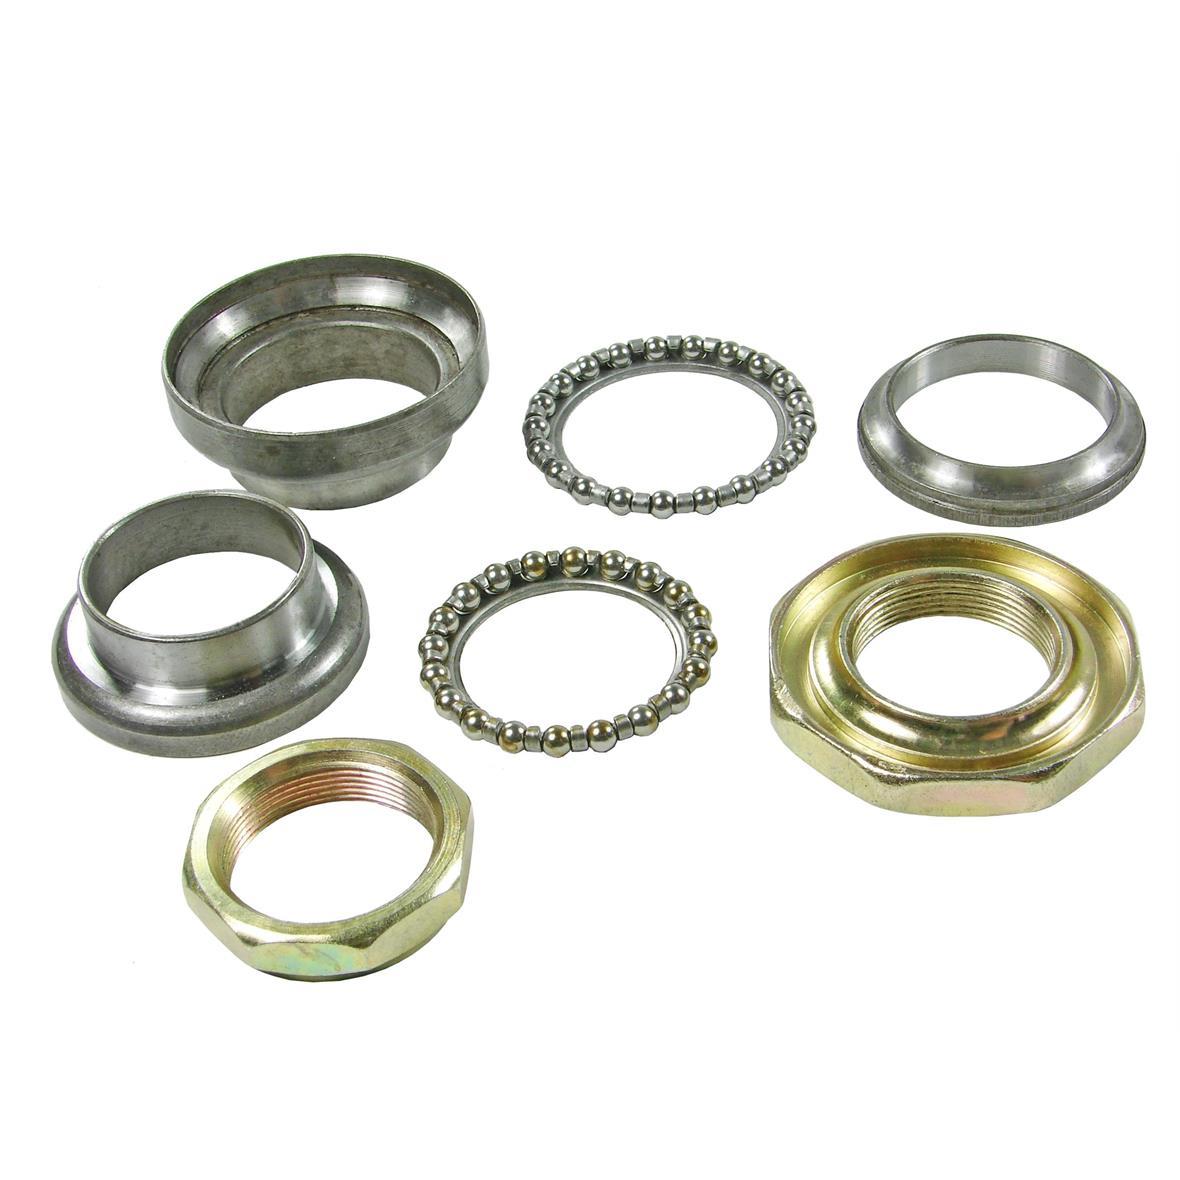 Product Image for 'Bearing Set HandlebarTitle'